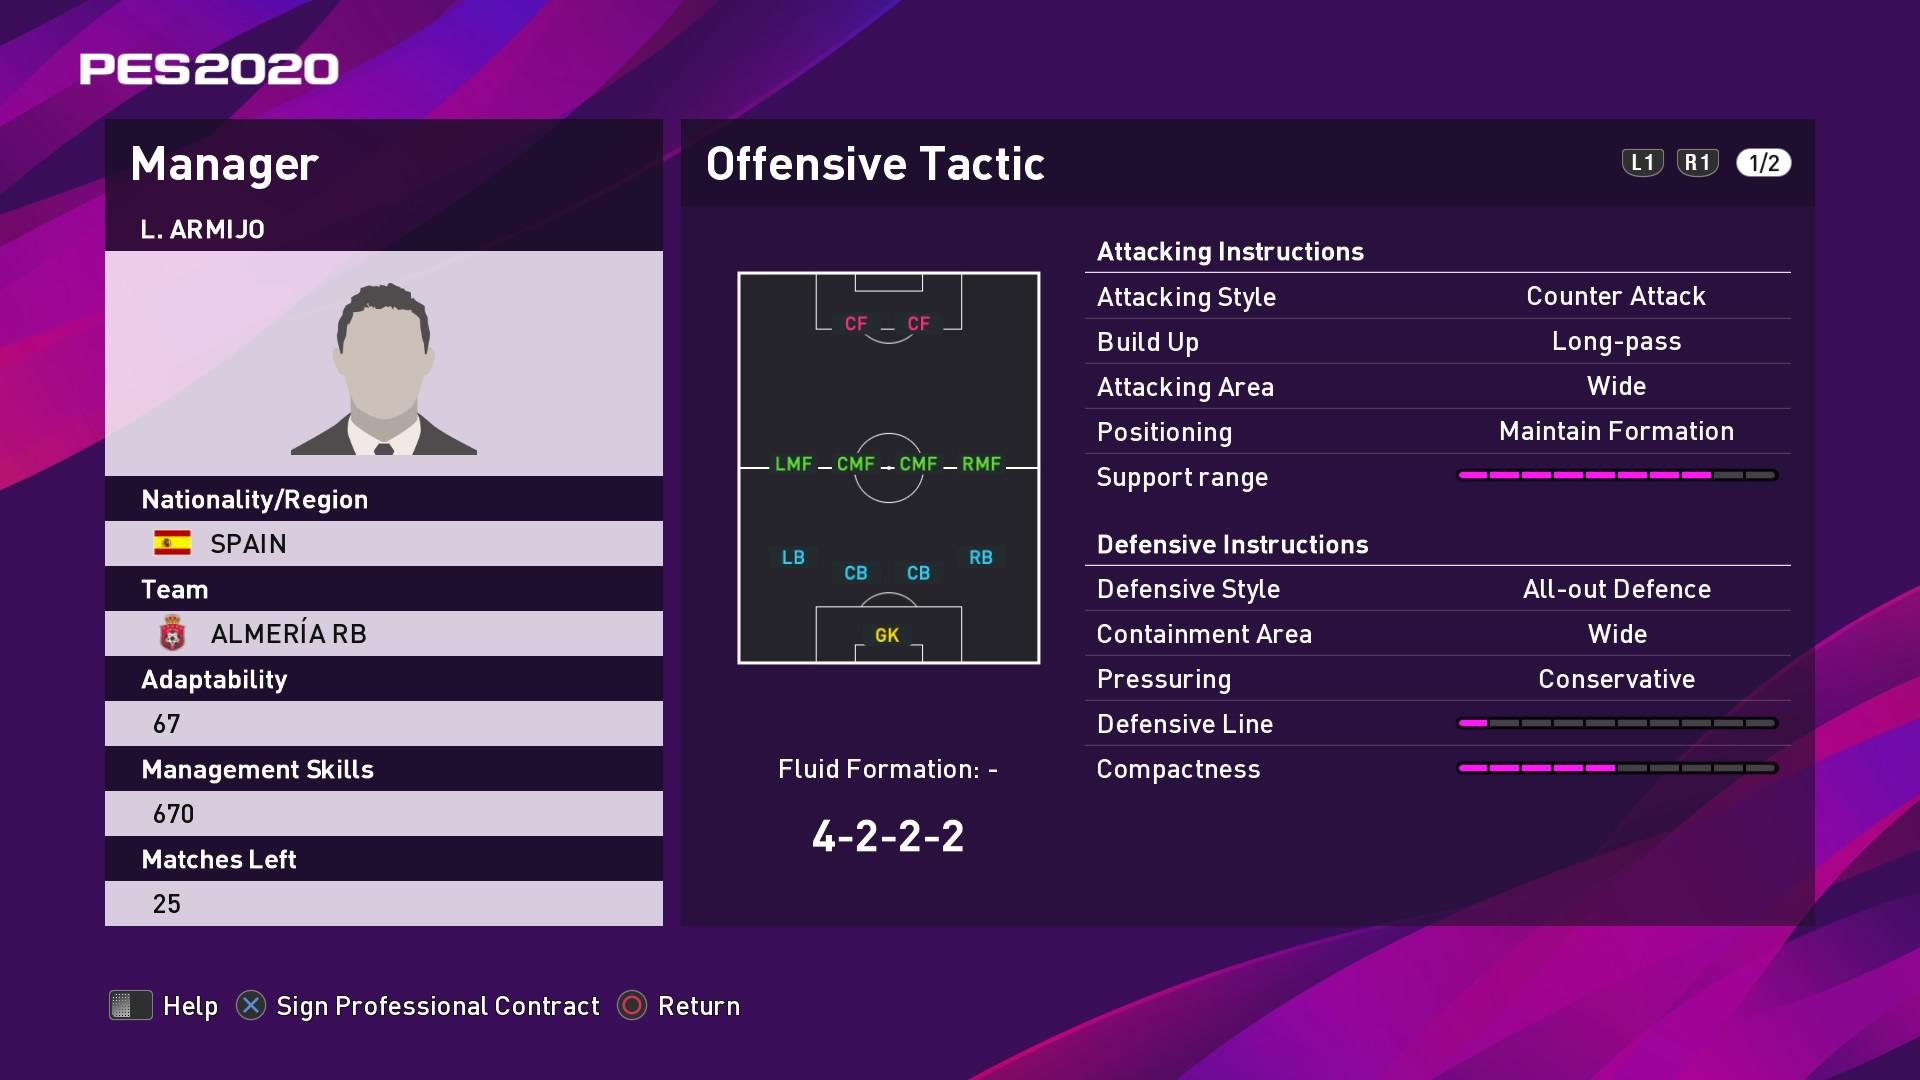 L. Armijo (Guti) Offensive Tactic in PES 2020 myClub